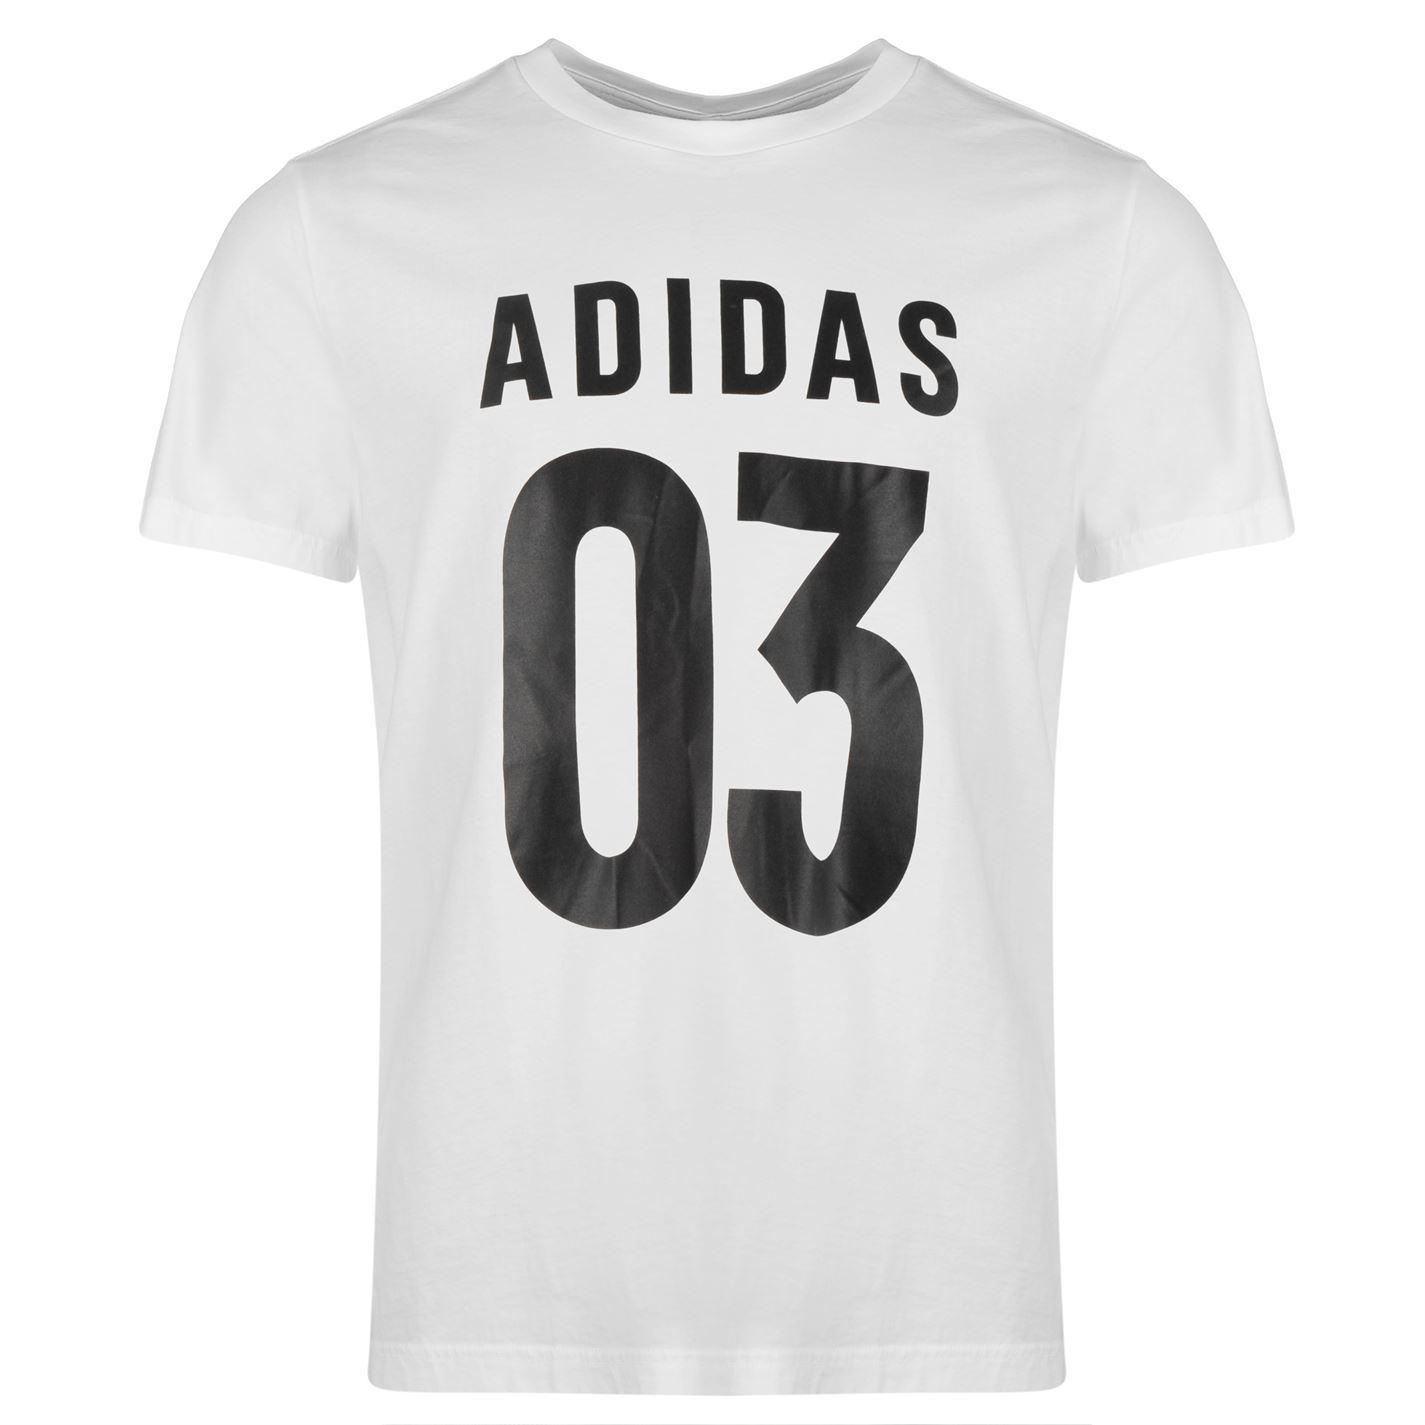 adidas Sleeve Top Crew Shirt 03 Tee Mens Gents Short Neck Cotton T O8rOvwq